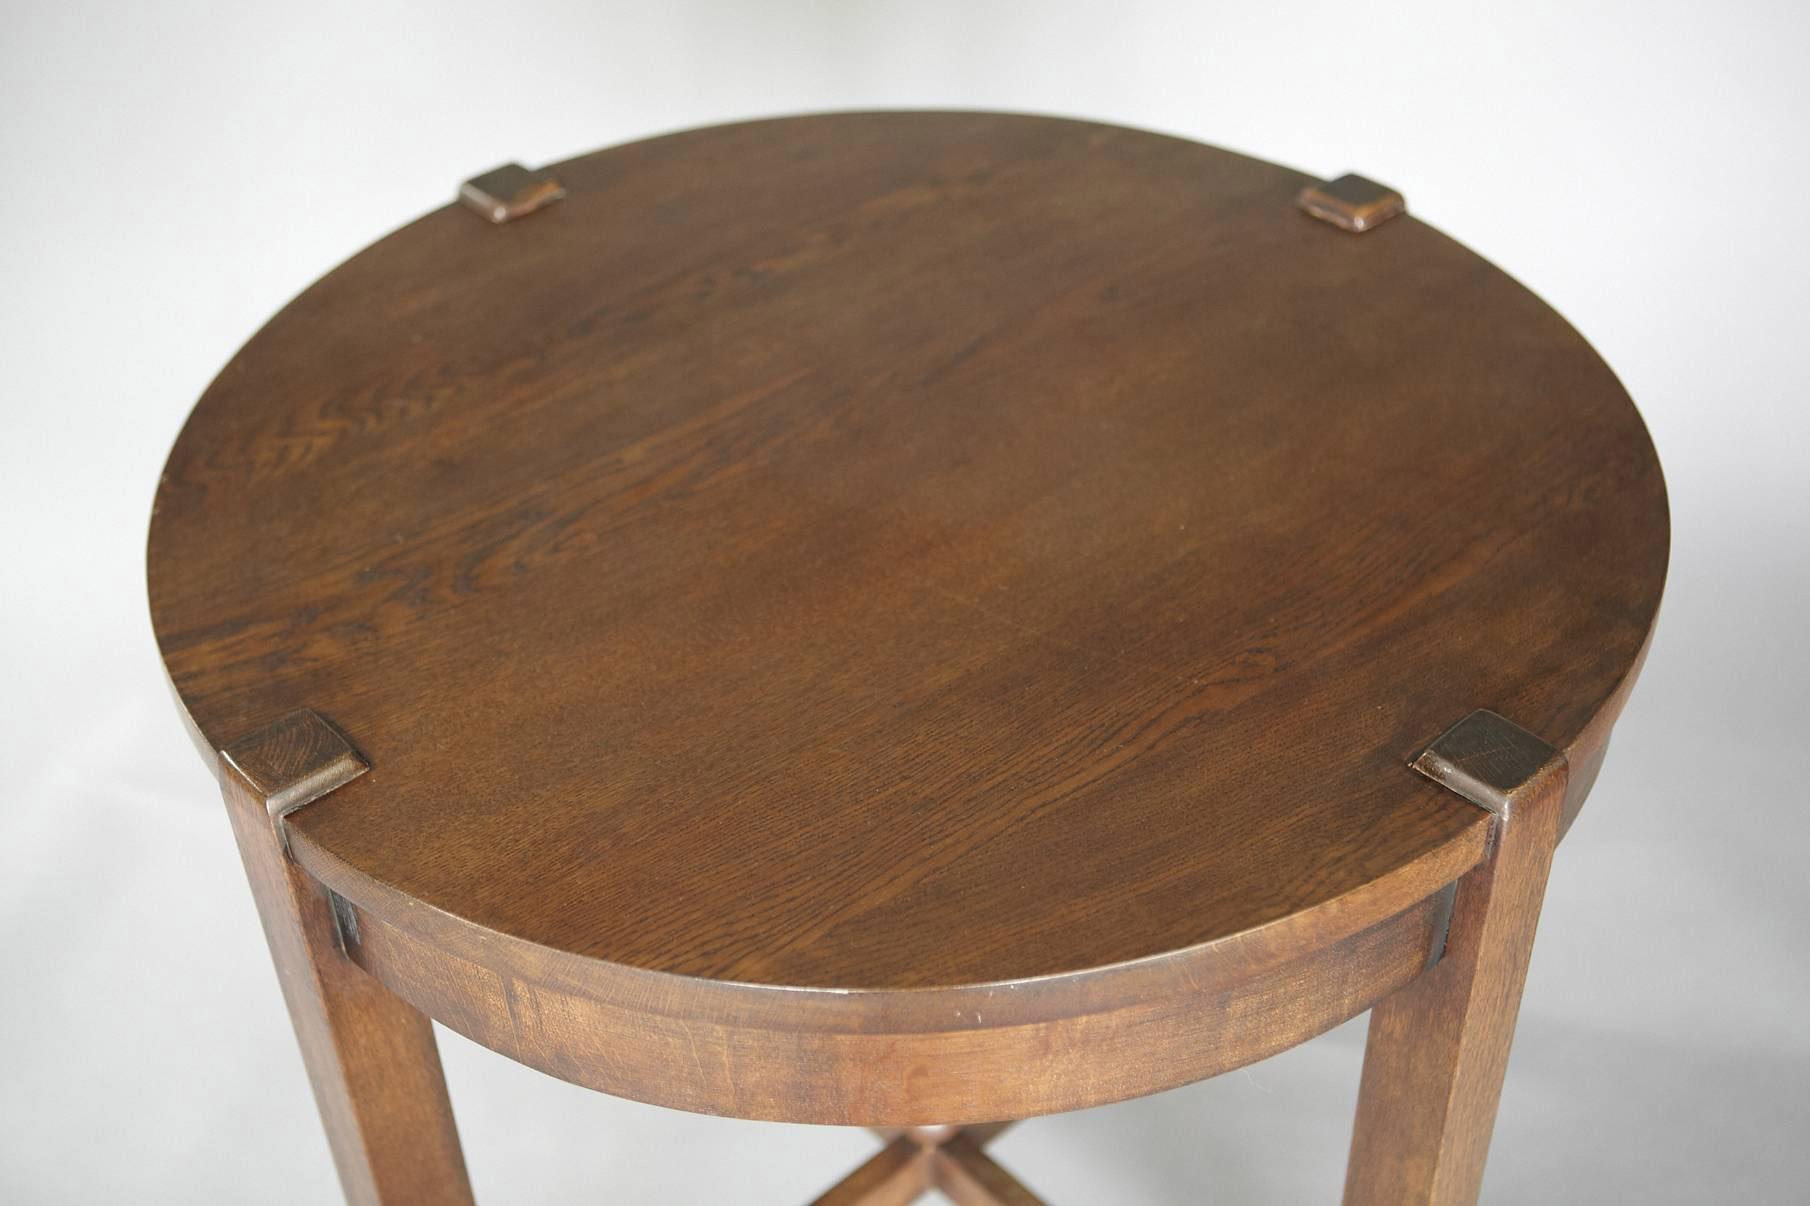 Antique oak arts crafts oak lamp table jens buettner design series0415 artsandcrafts round lamp table copy03 mg8783g geotapseo Choice Image